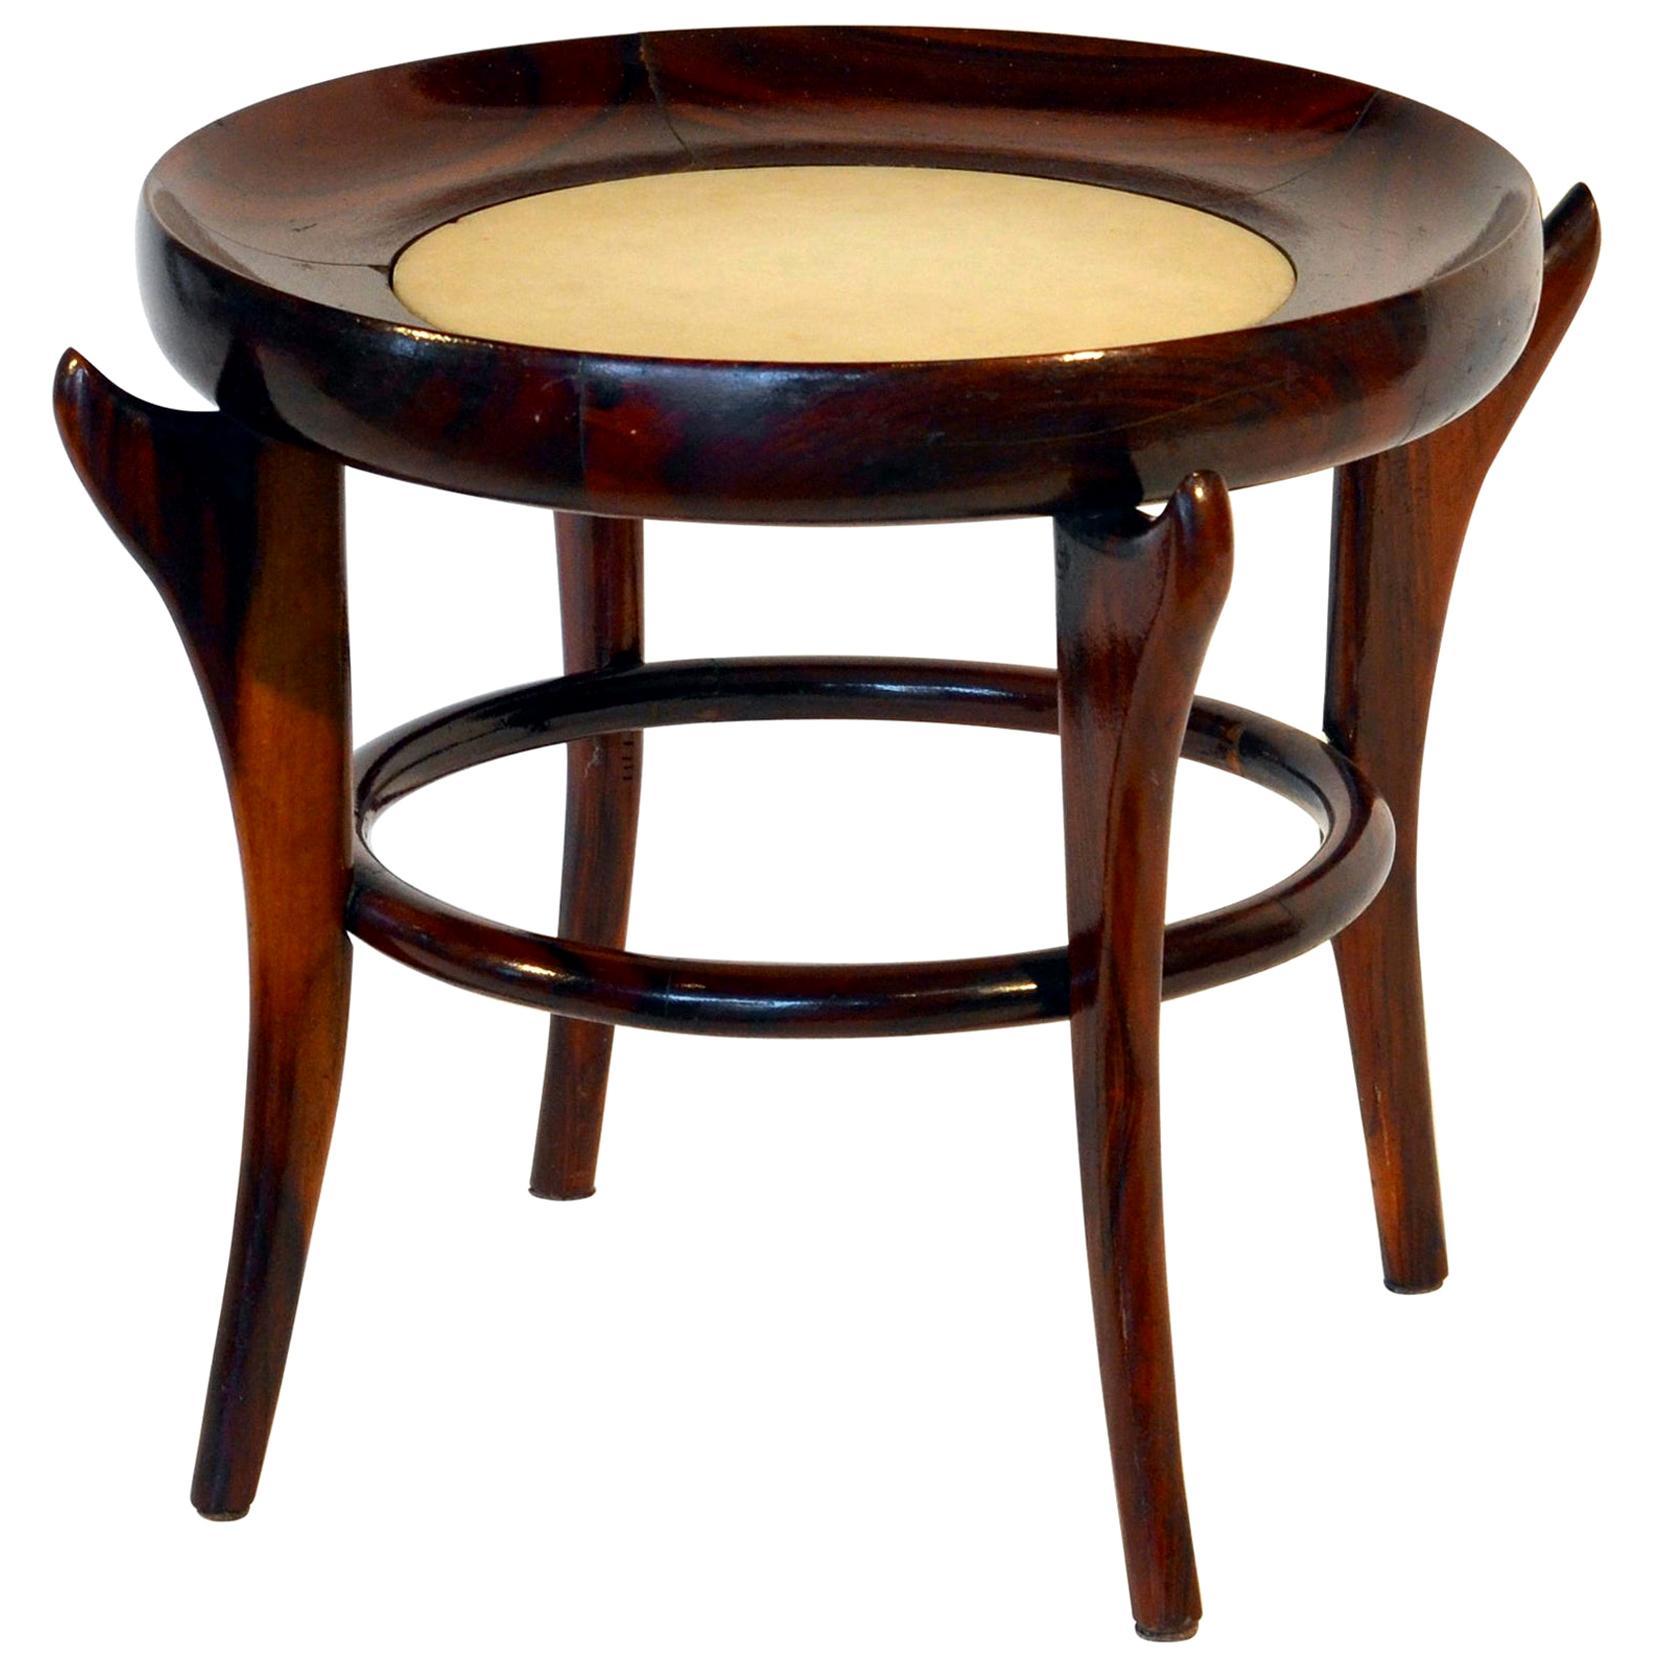 Rare 'Maracana' Brazilian Jacaranda Side Table by Guiseppe Scapinelli